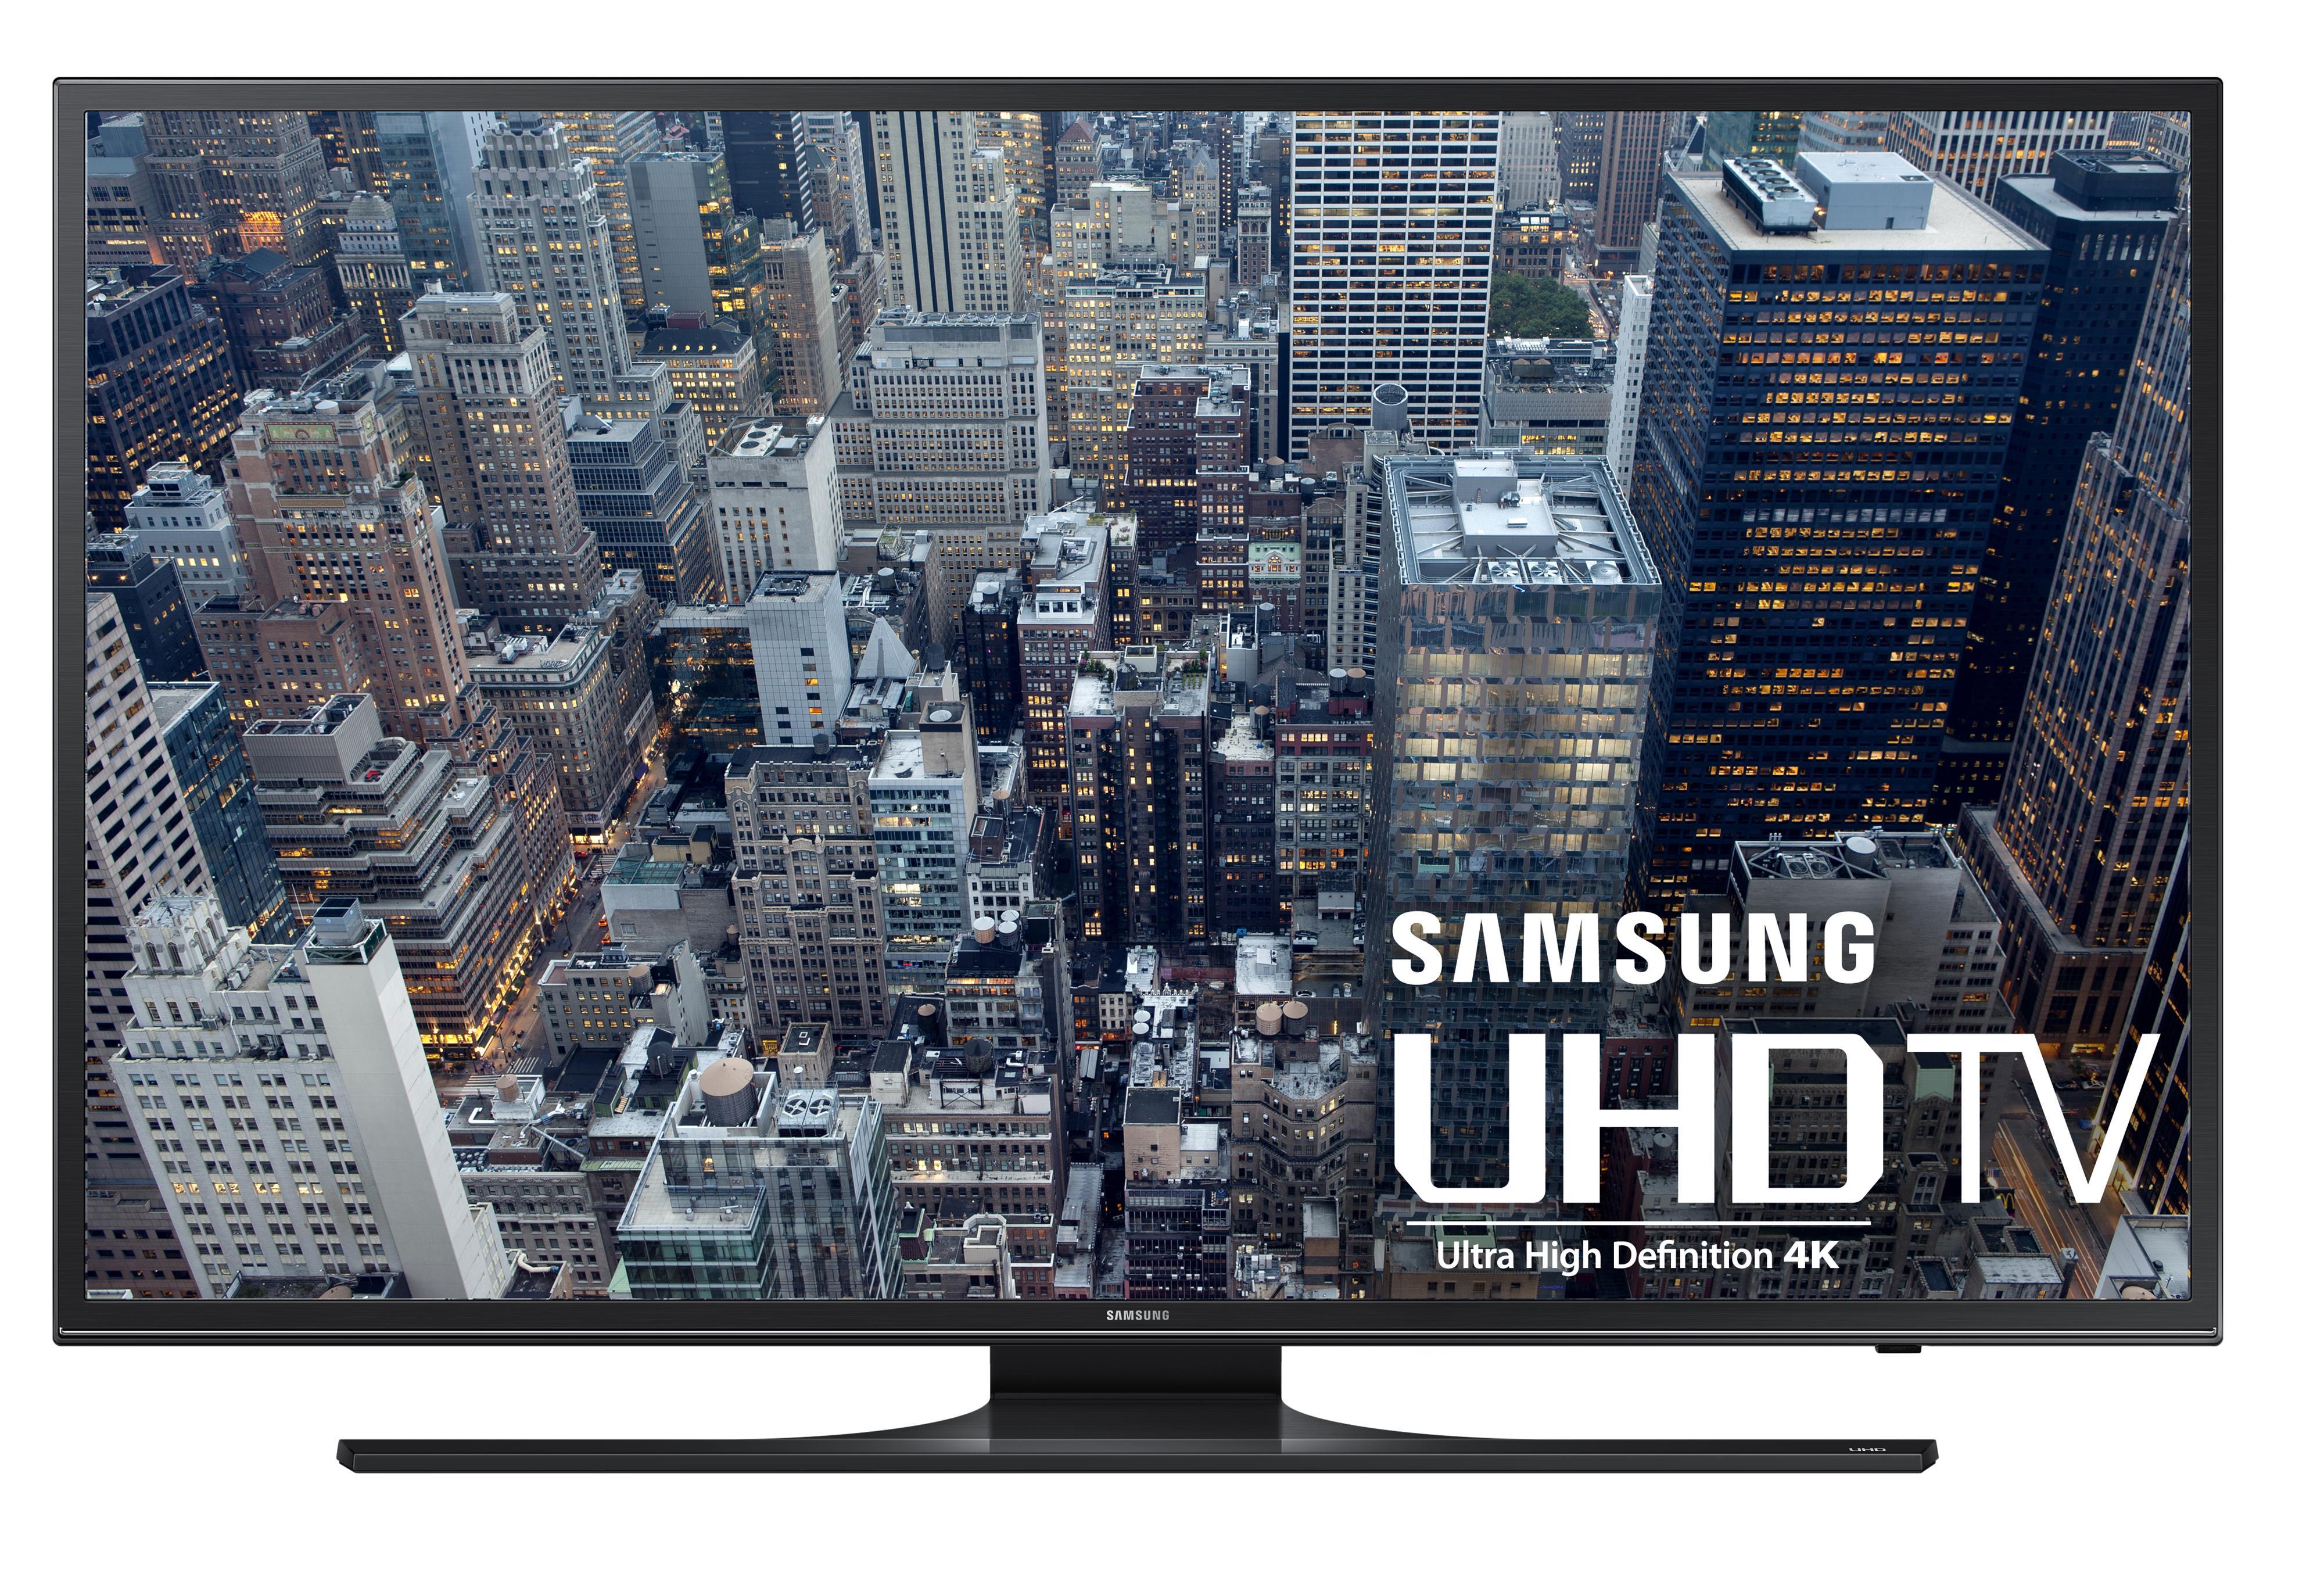 "Samsung Electronics Samsung LED TVs 2015 4K UHD JU6500 Series Smart TV - 40"" - Item Number: UN40JU6500FXZA"